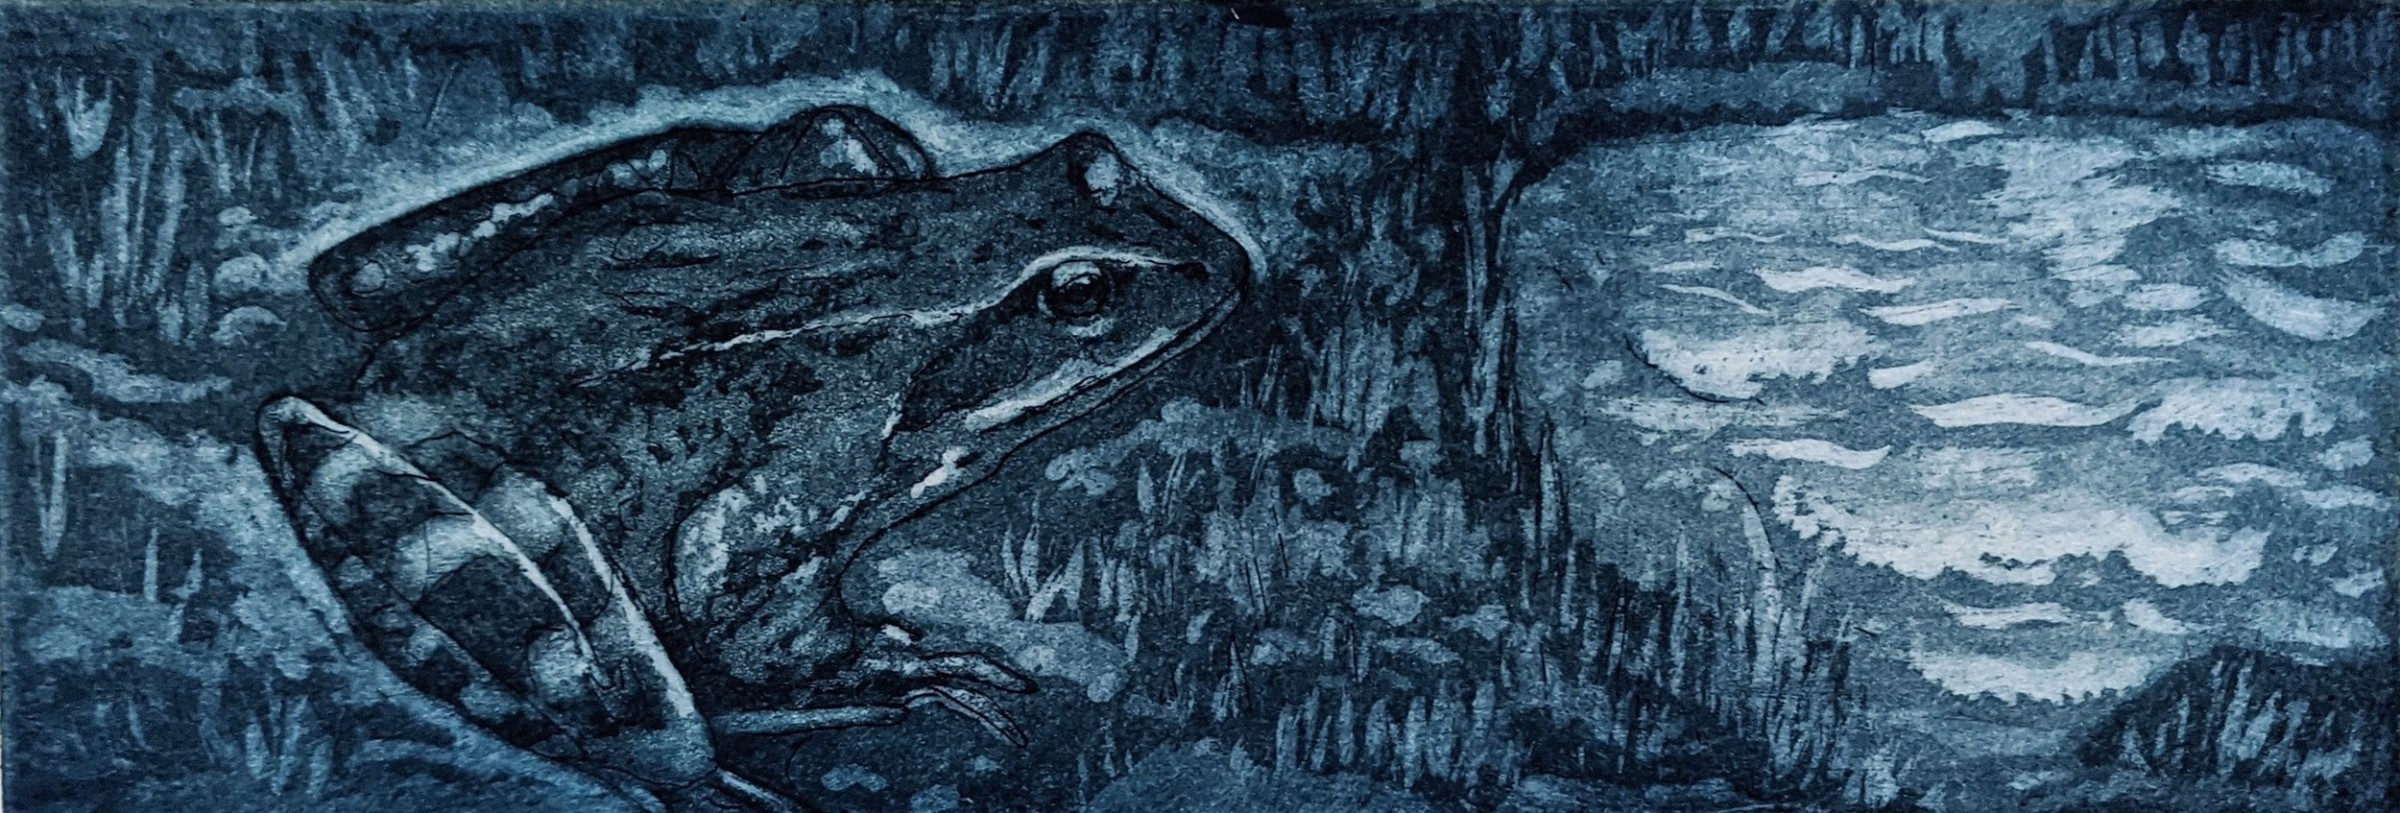 "<span class=""link fancybox-details-link""><a href=""/exhibitions/23/works/artworks_standalone11271/"">View Detail Page</a></span><div class=""artist""><span class=""artist""><strong>Linda Landers RE</strong></span></div><div class=""title""><em>Blue Frog</em></div><div class=""medium"">etching and aquatint</div><div class=""dimensions"">24 x 34cm</div><div class=""edition_details"">edition of 45</div>"